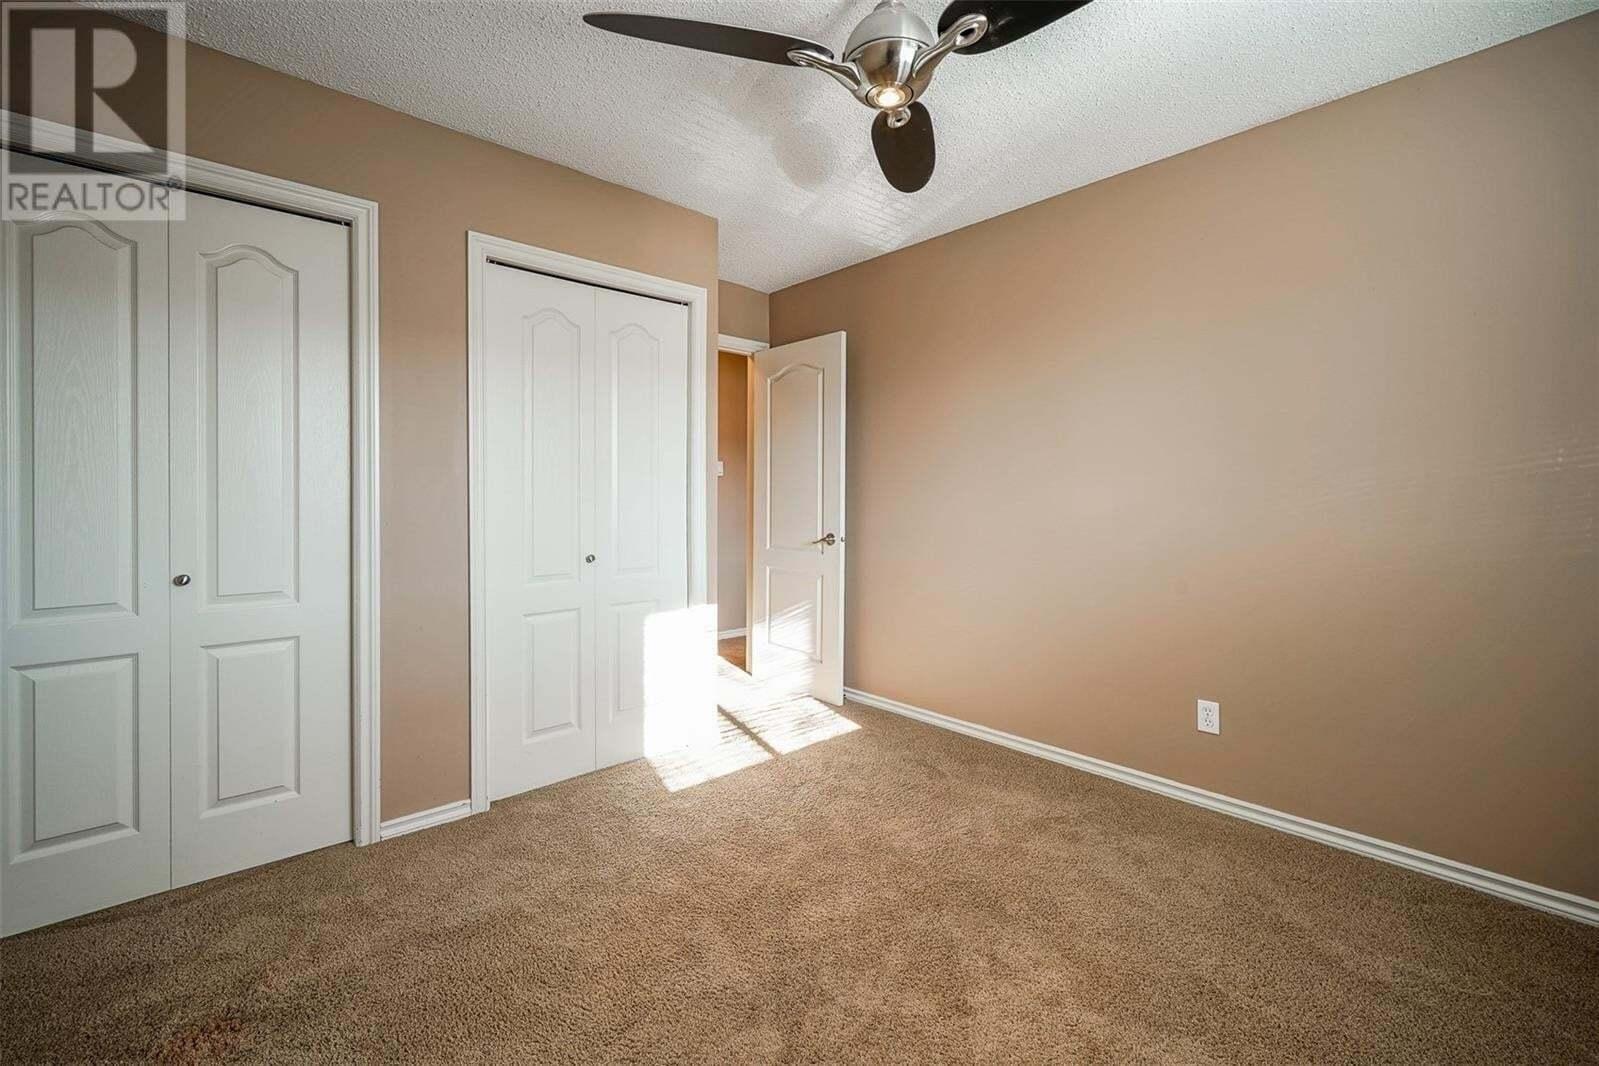 Condo for sale at 1121 Mckercher Dr Unit 306E Saskatoon Saskatchewan - MLS: SK813562